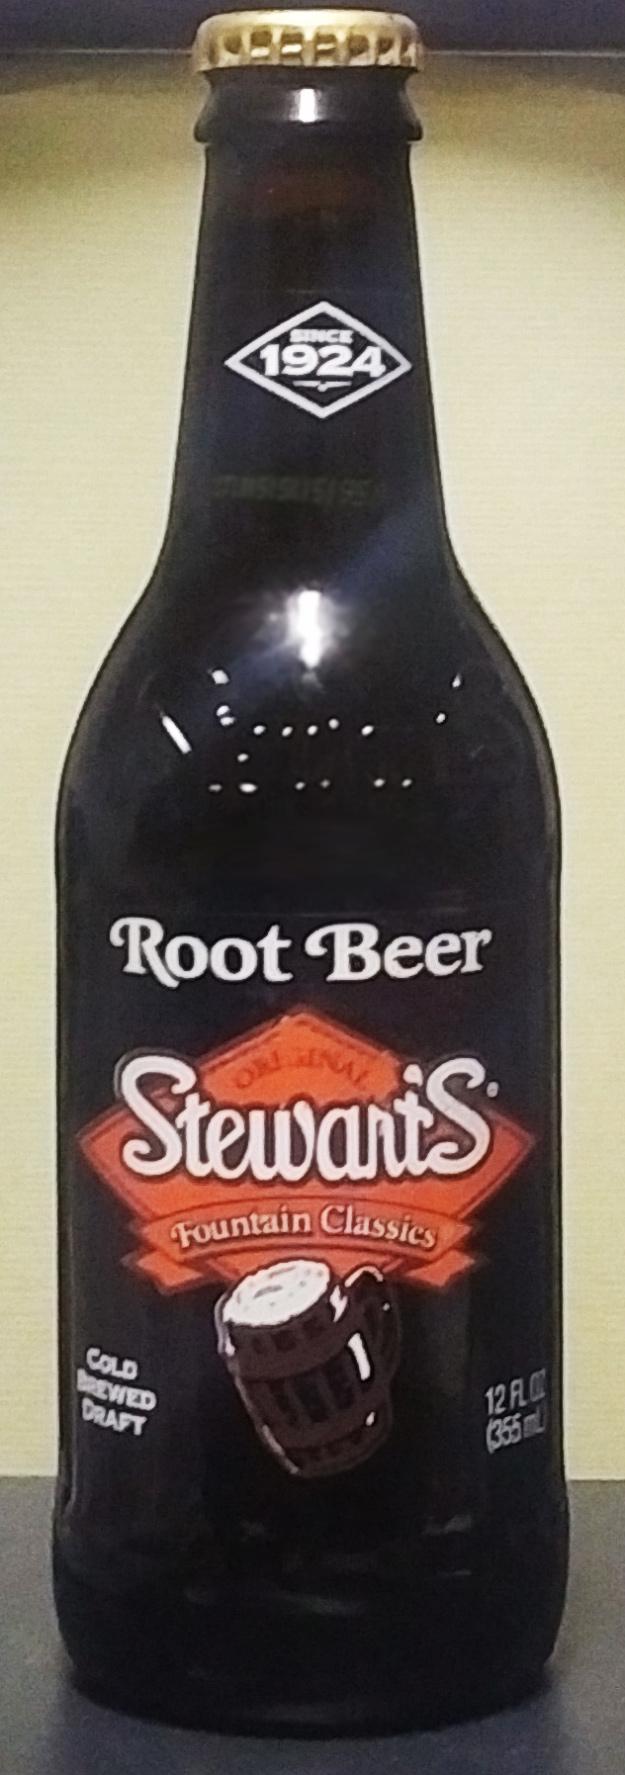 Original Stewart's Fountain Classics